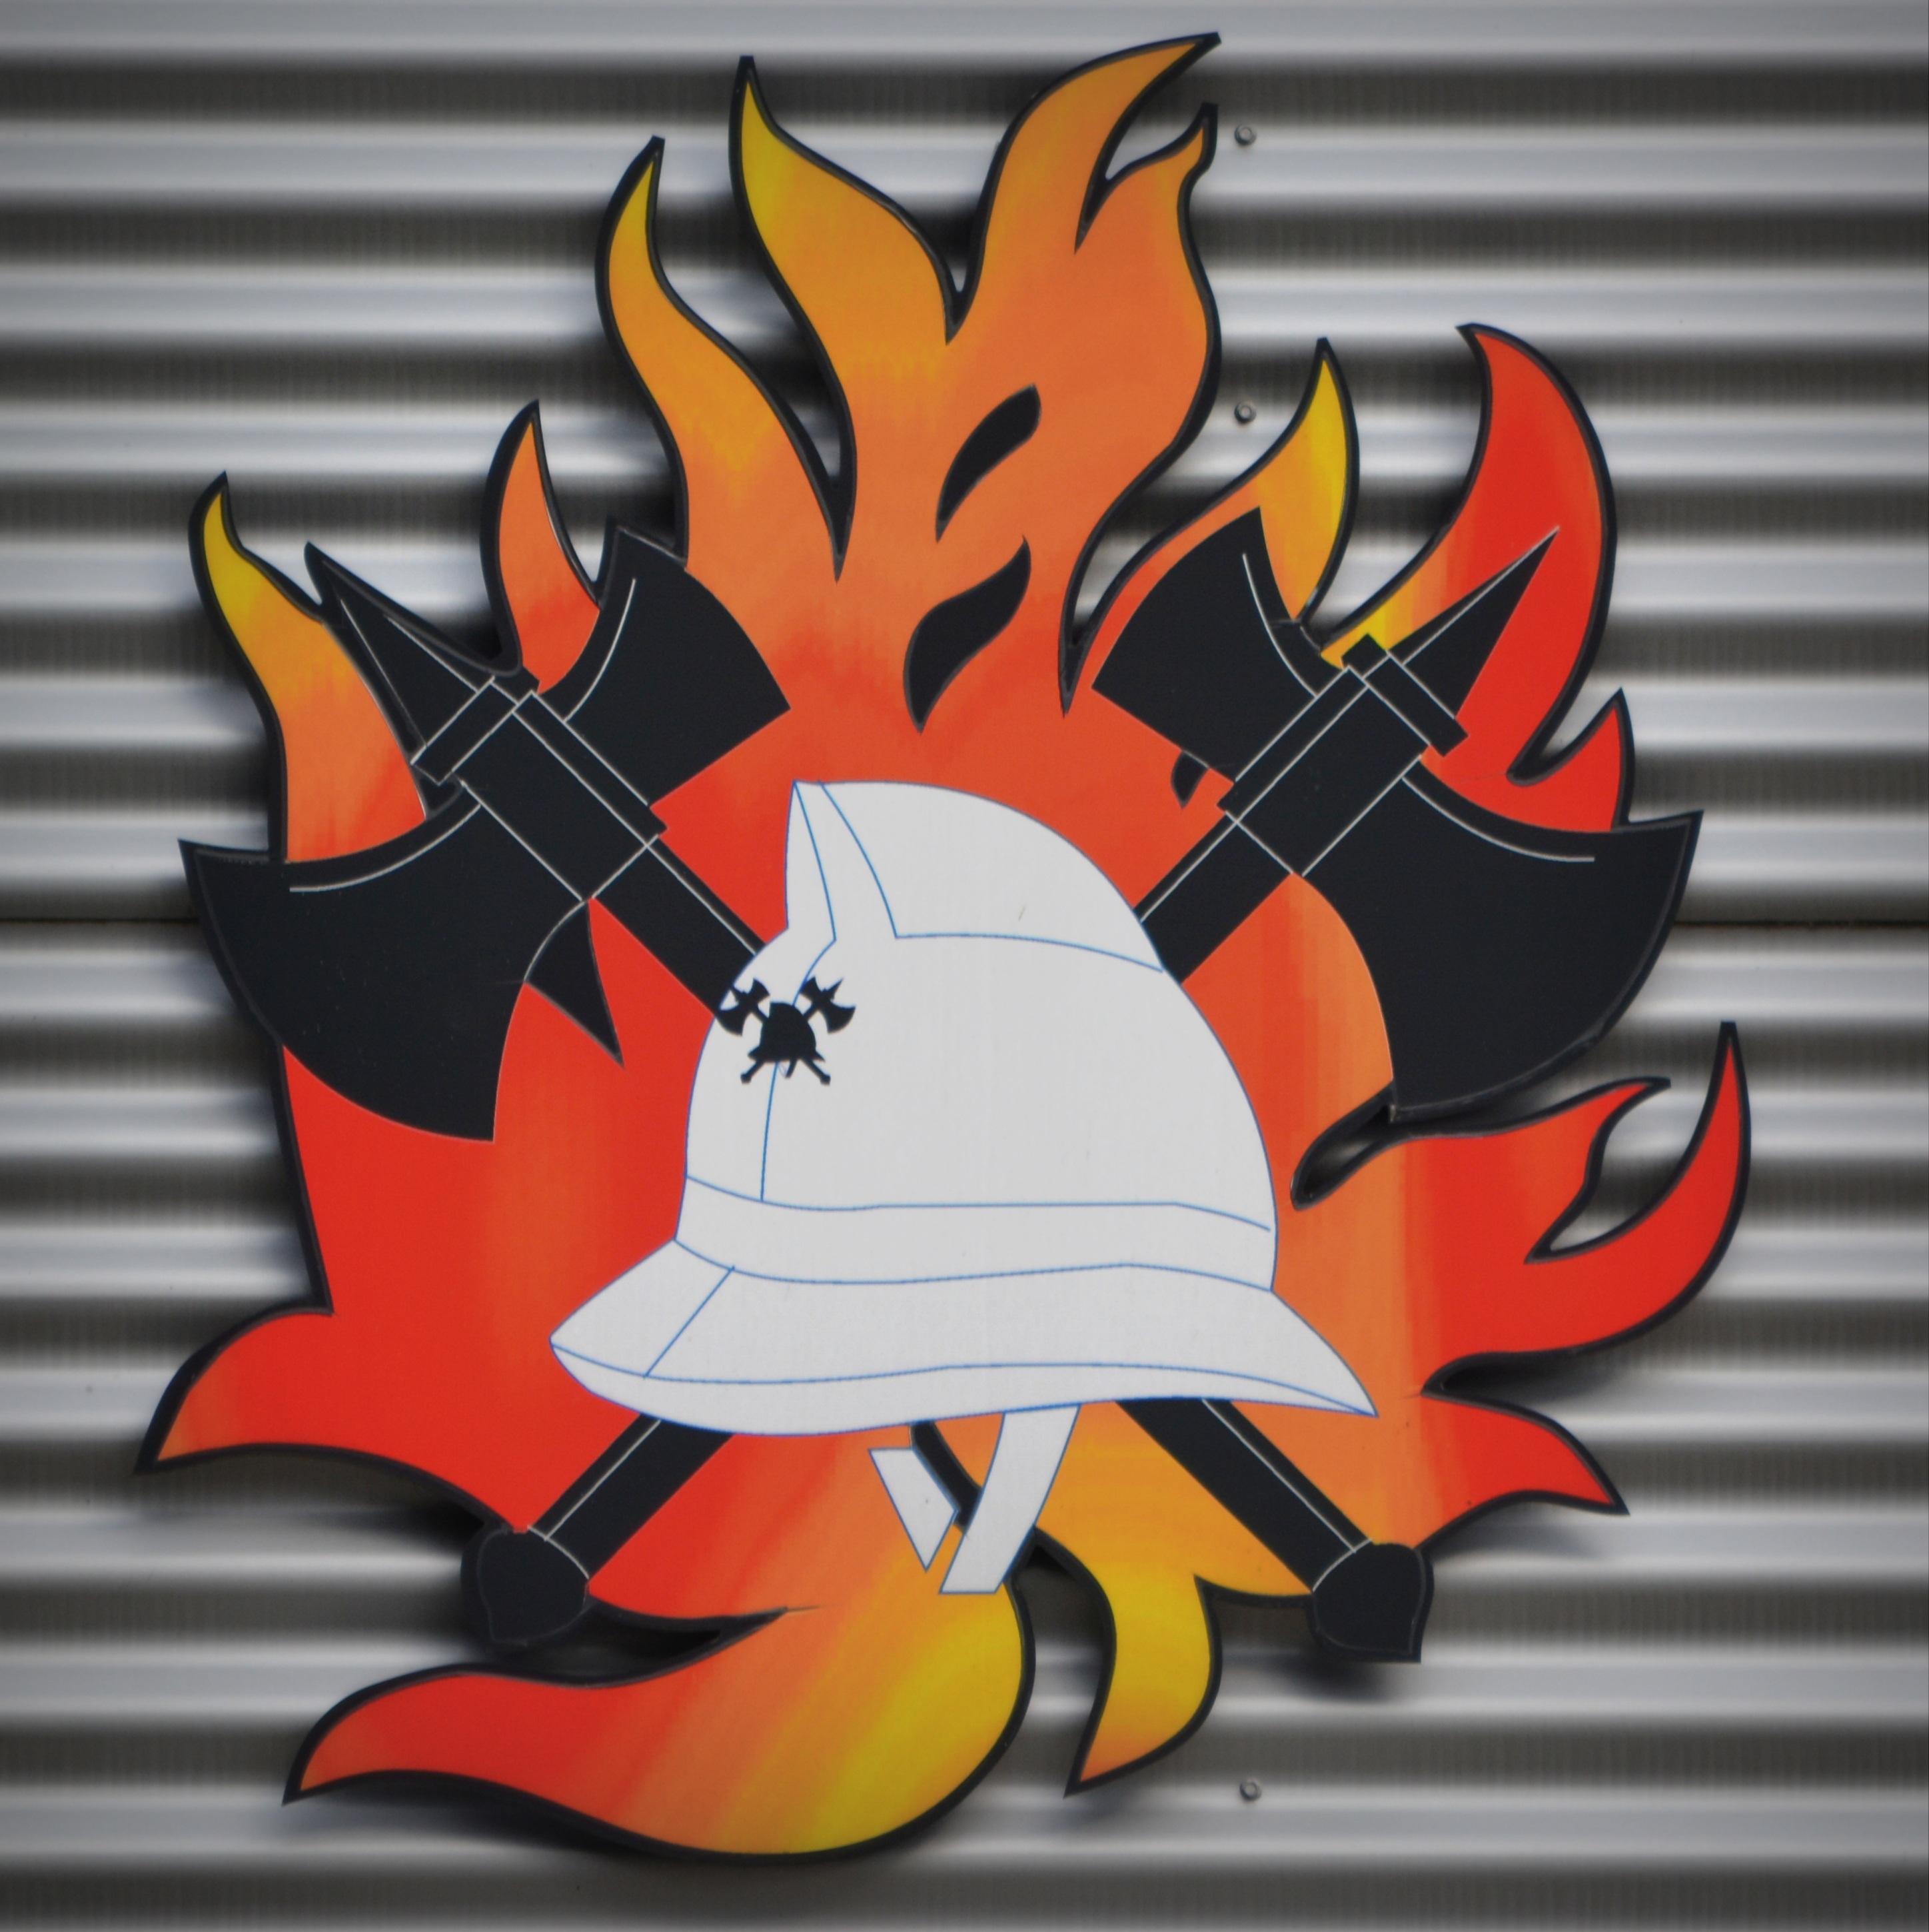 Gambar Api Seni Pemadam Kebakaran Ilustrasi Ketopong Gambar